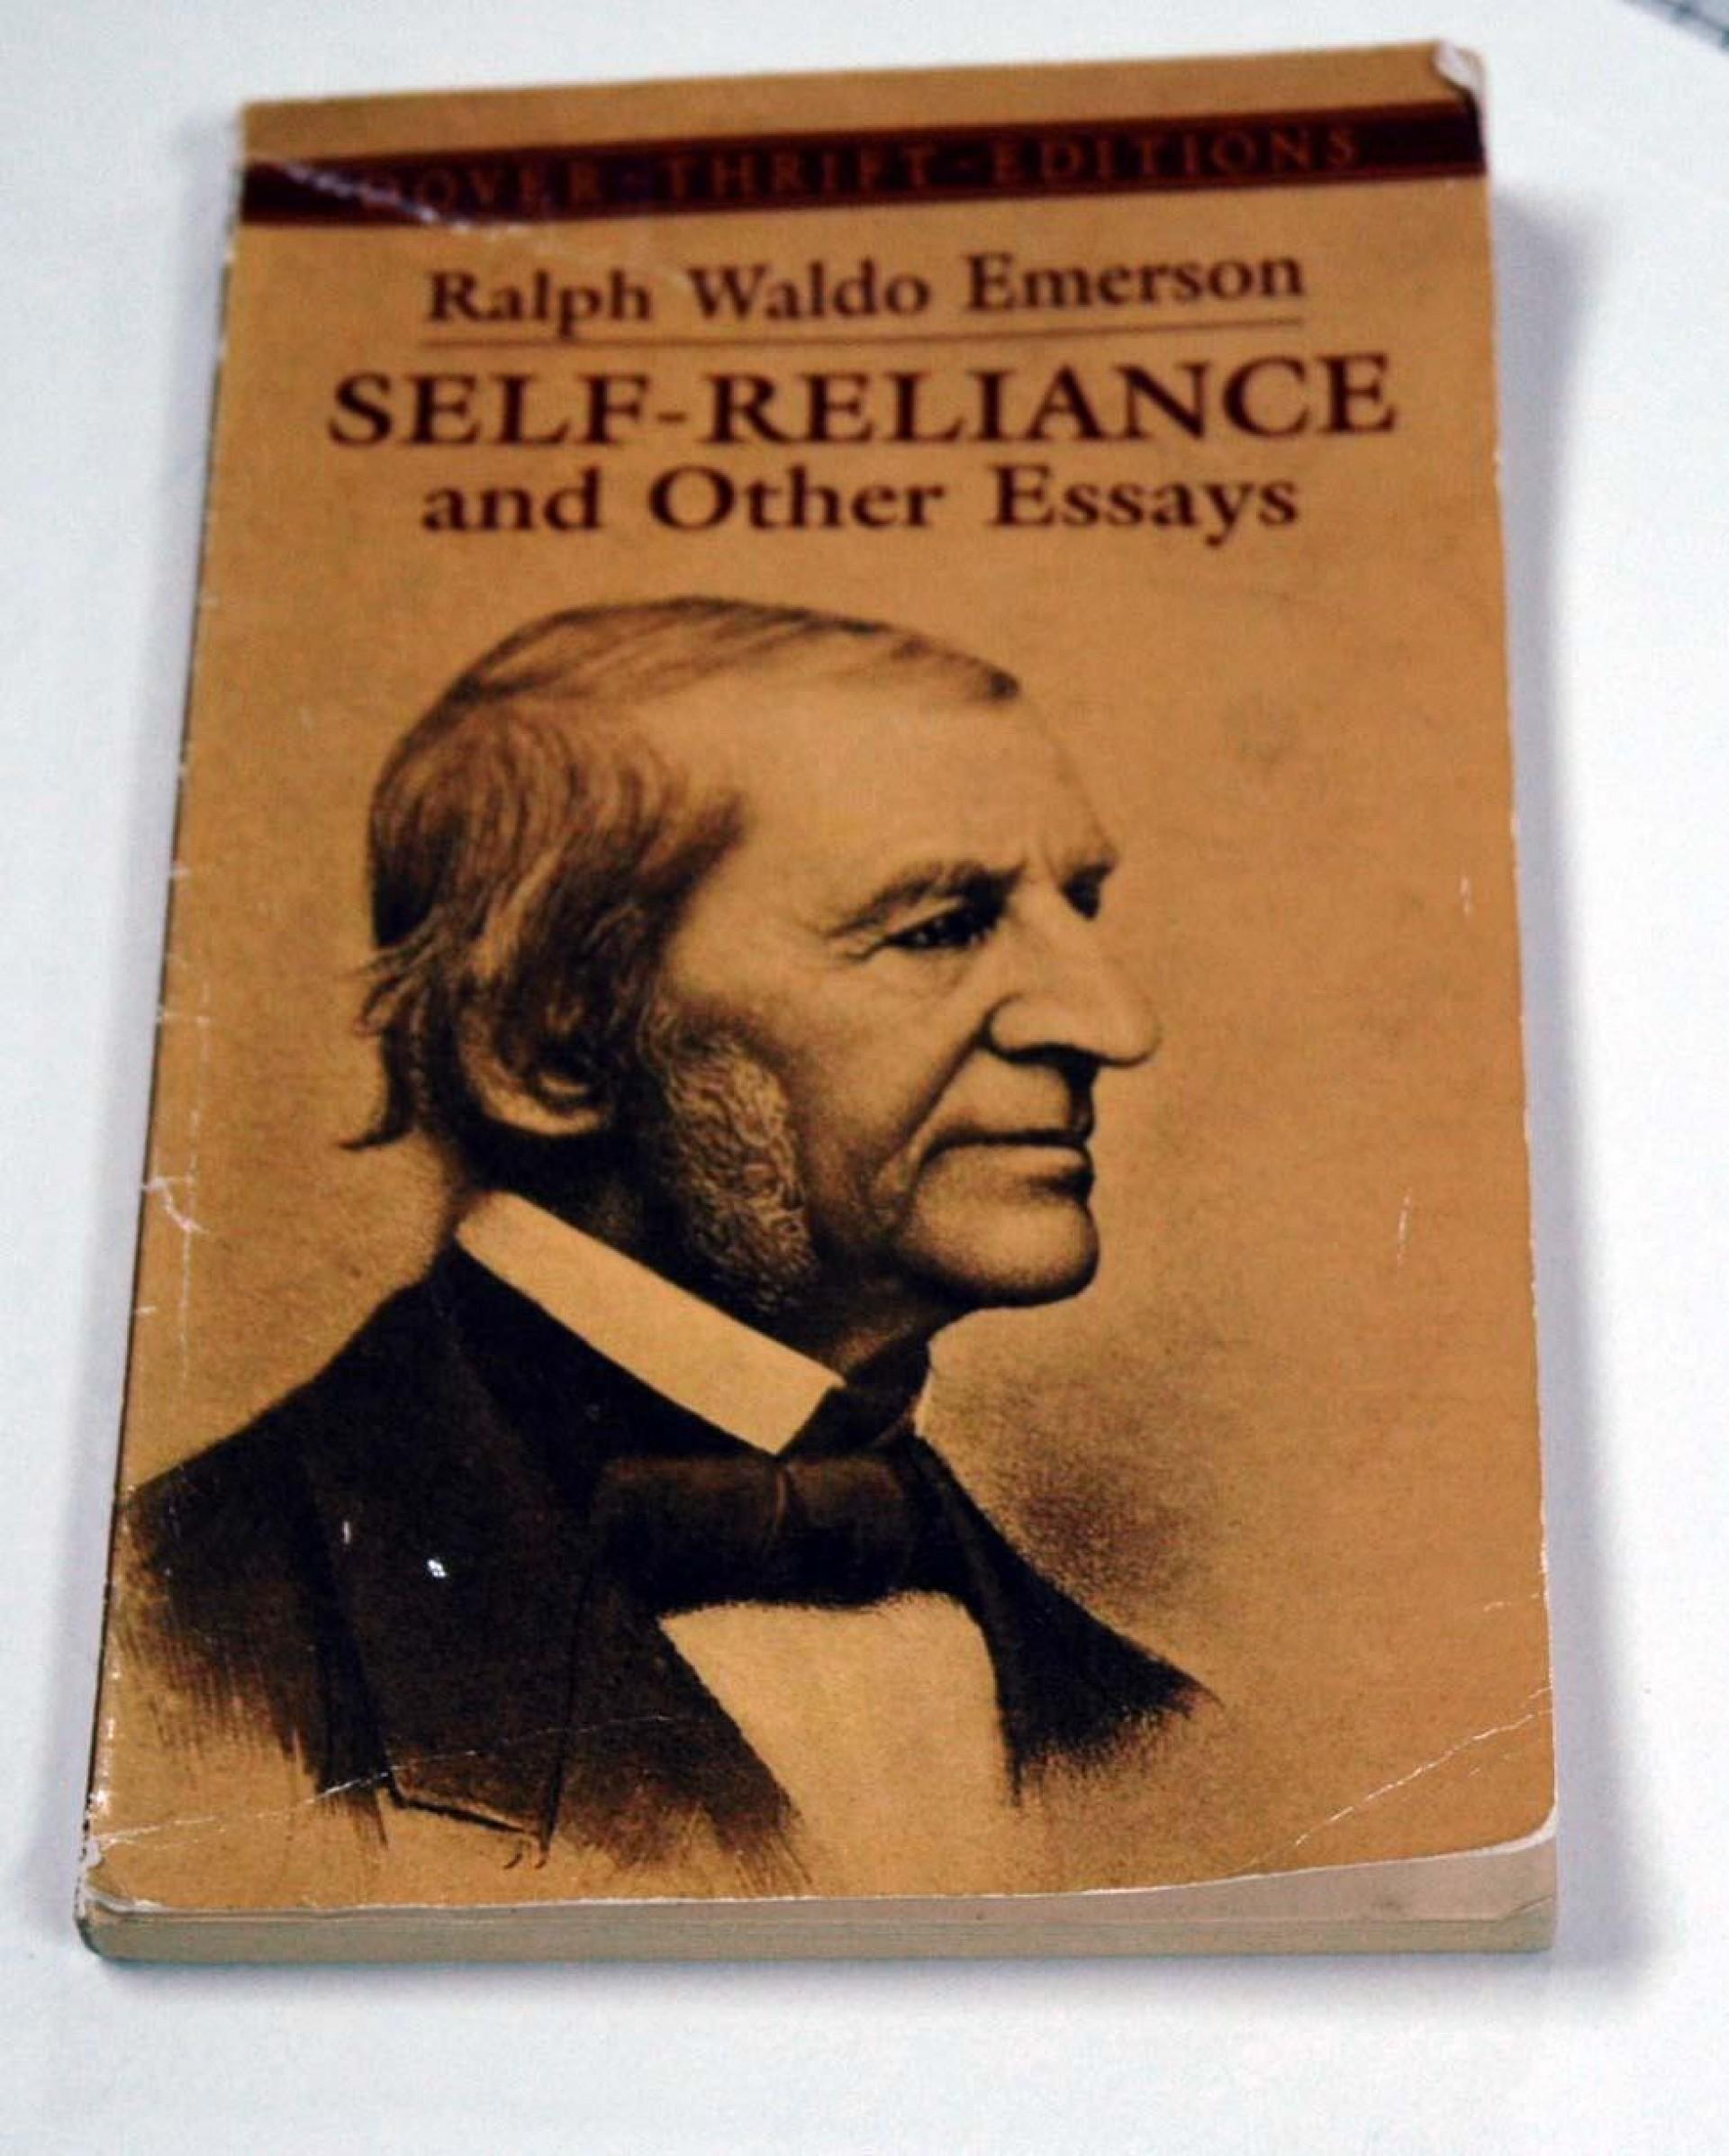 002 Self Reliance And Other Essays Essay Formidable Ralph Waldo Emerson Pdf Ekşi 1920